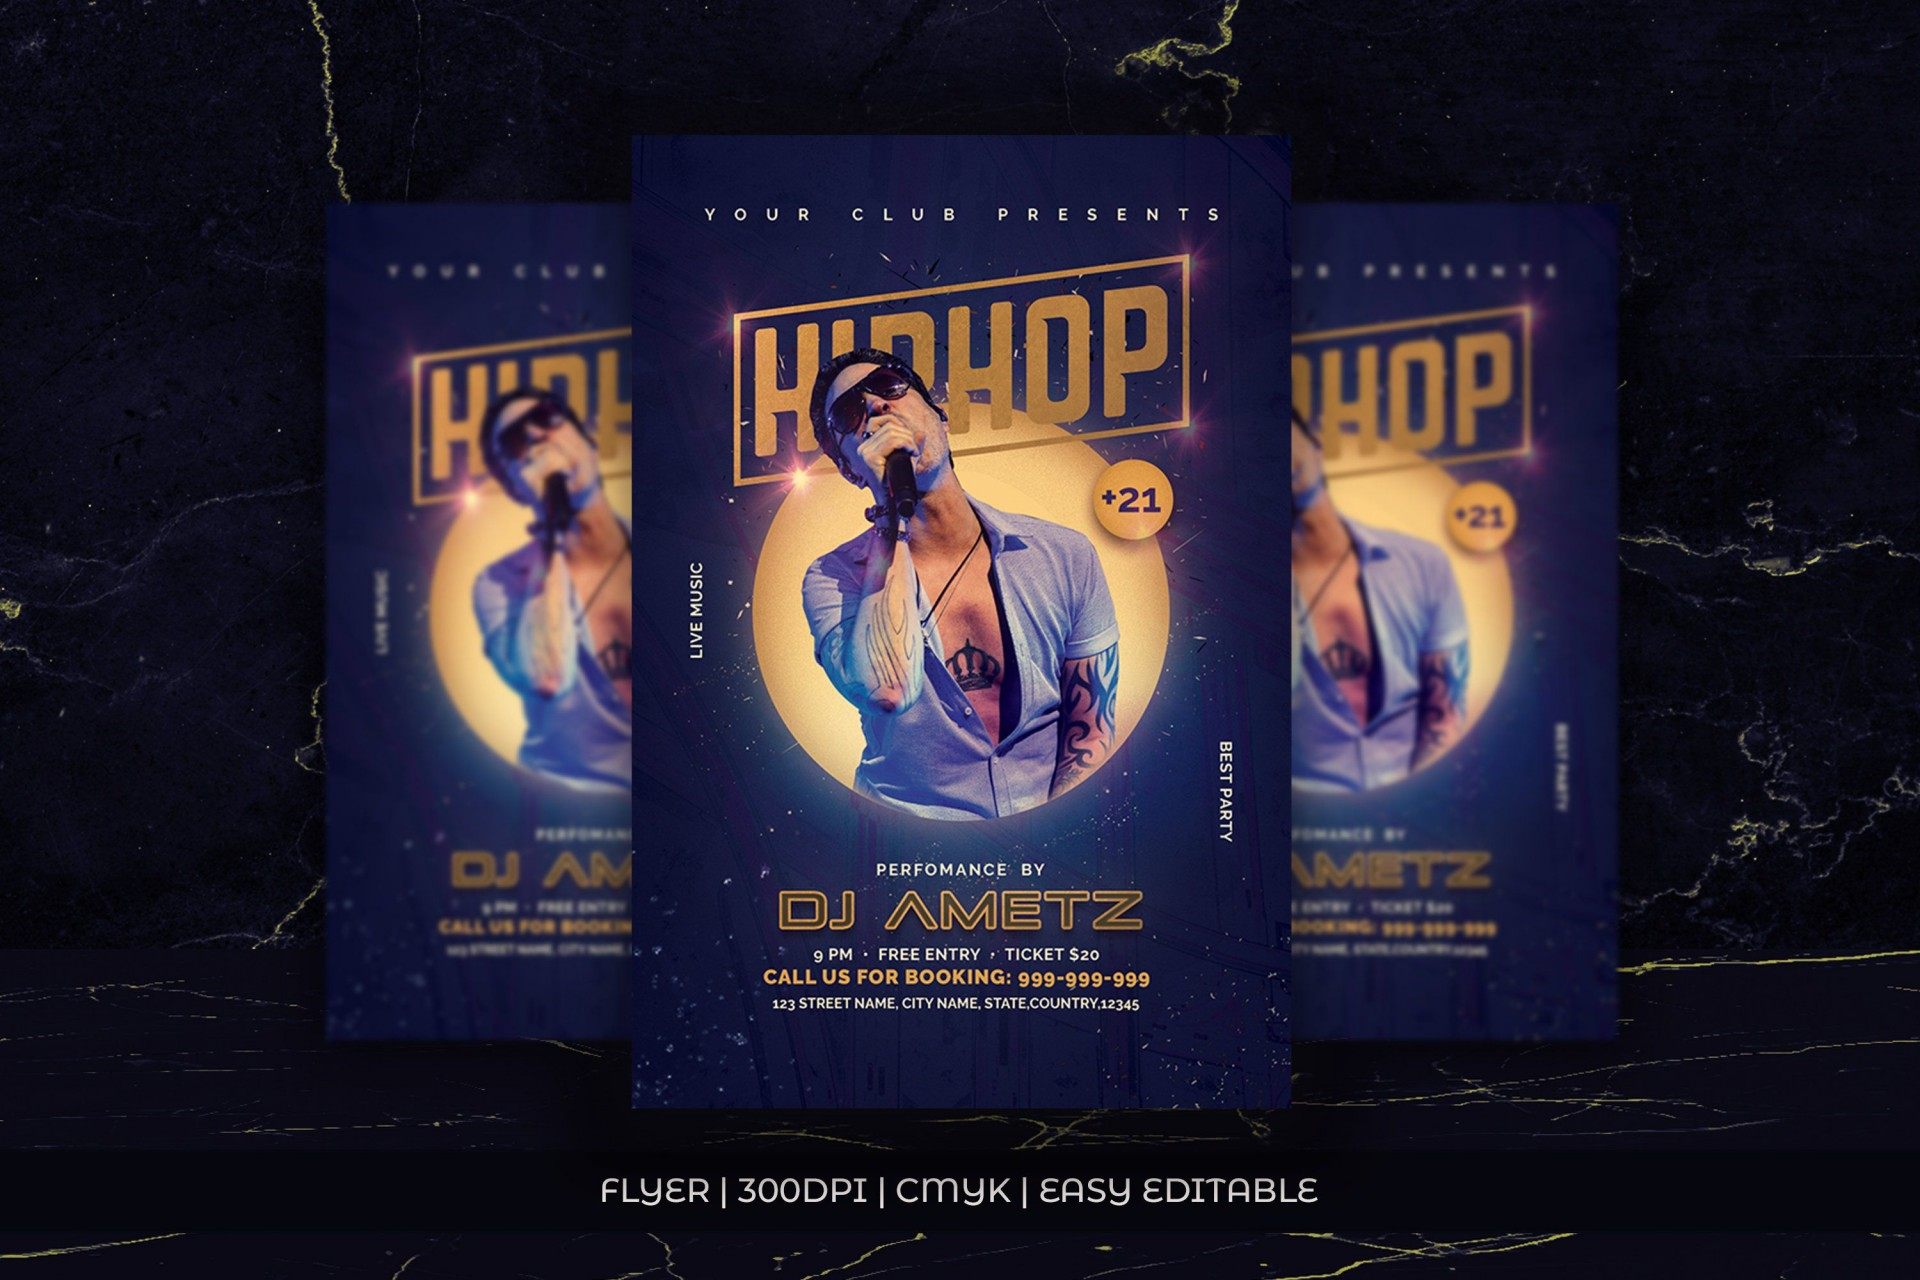 002 Singular Hip Hop Flyer Template Photo  Templates Hip-hop Party Free Download1920